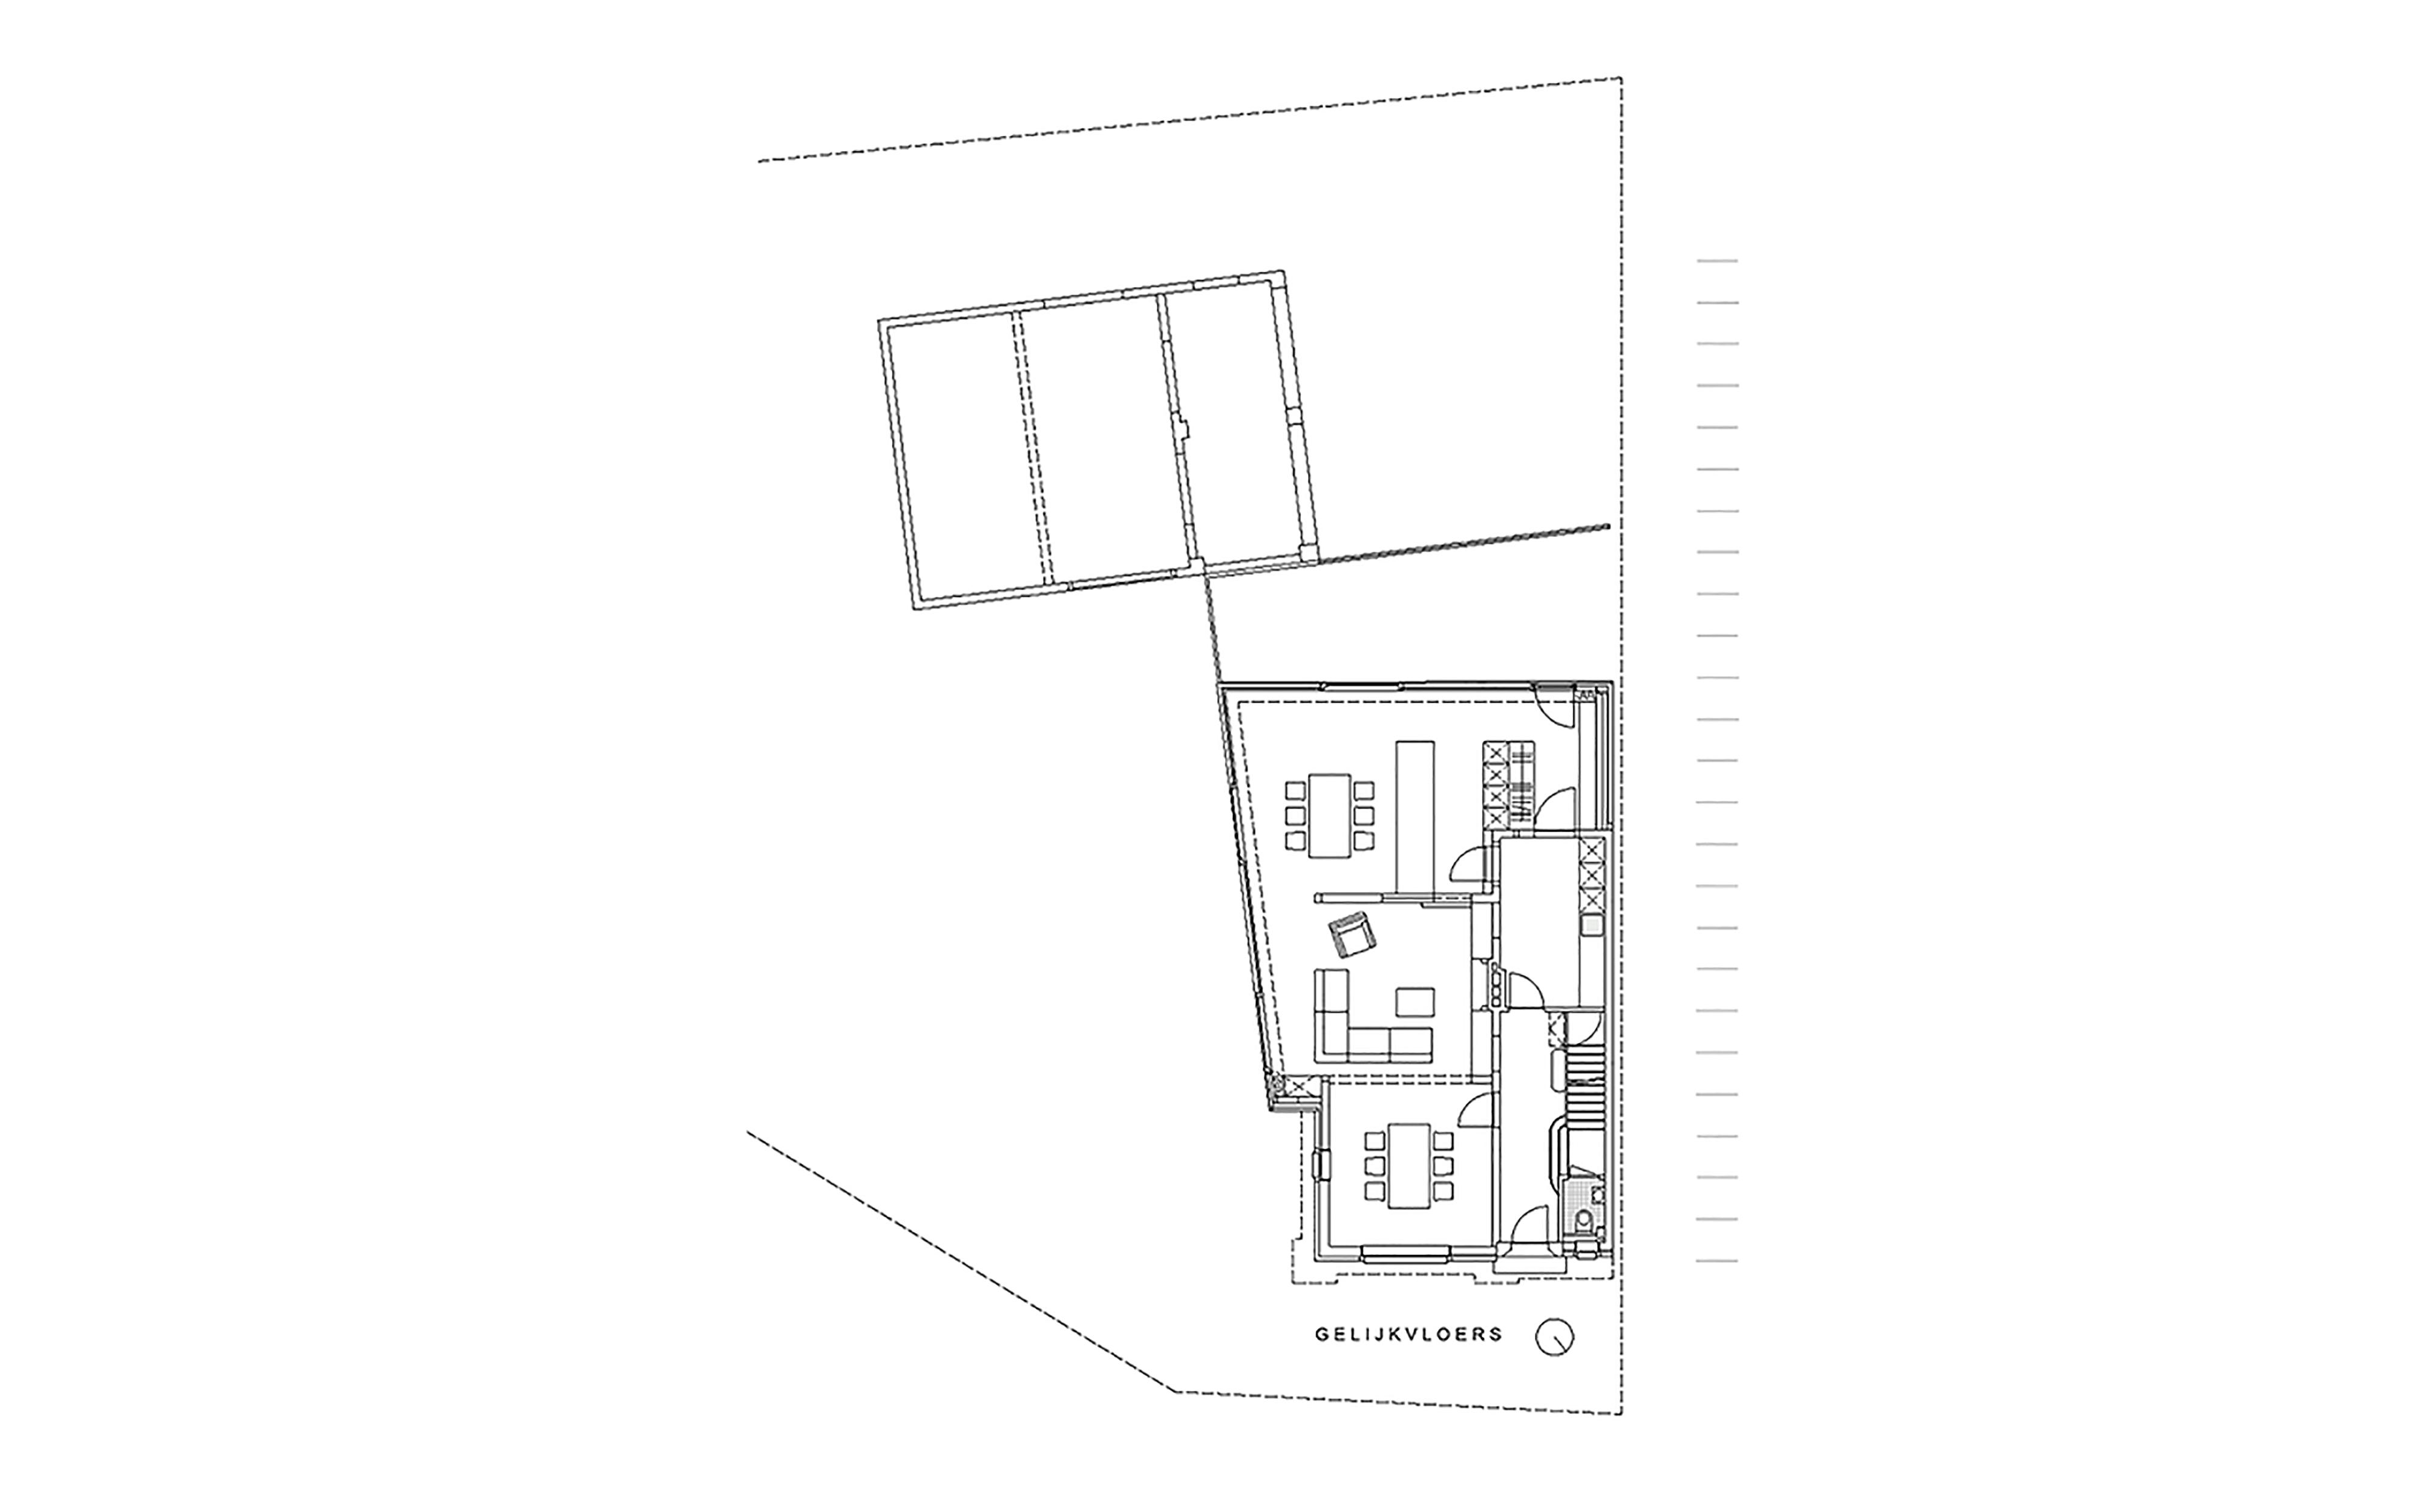 K1623-grondplan